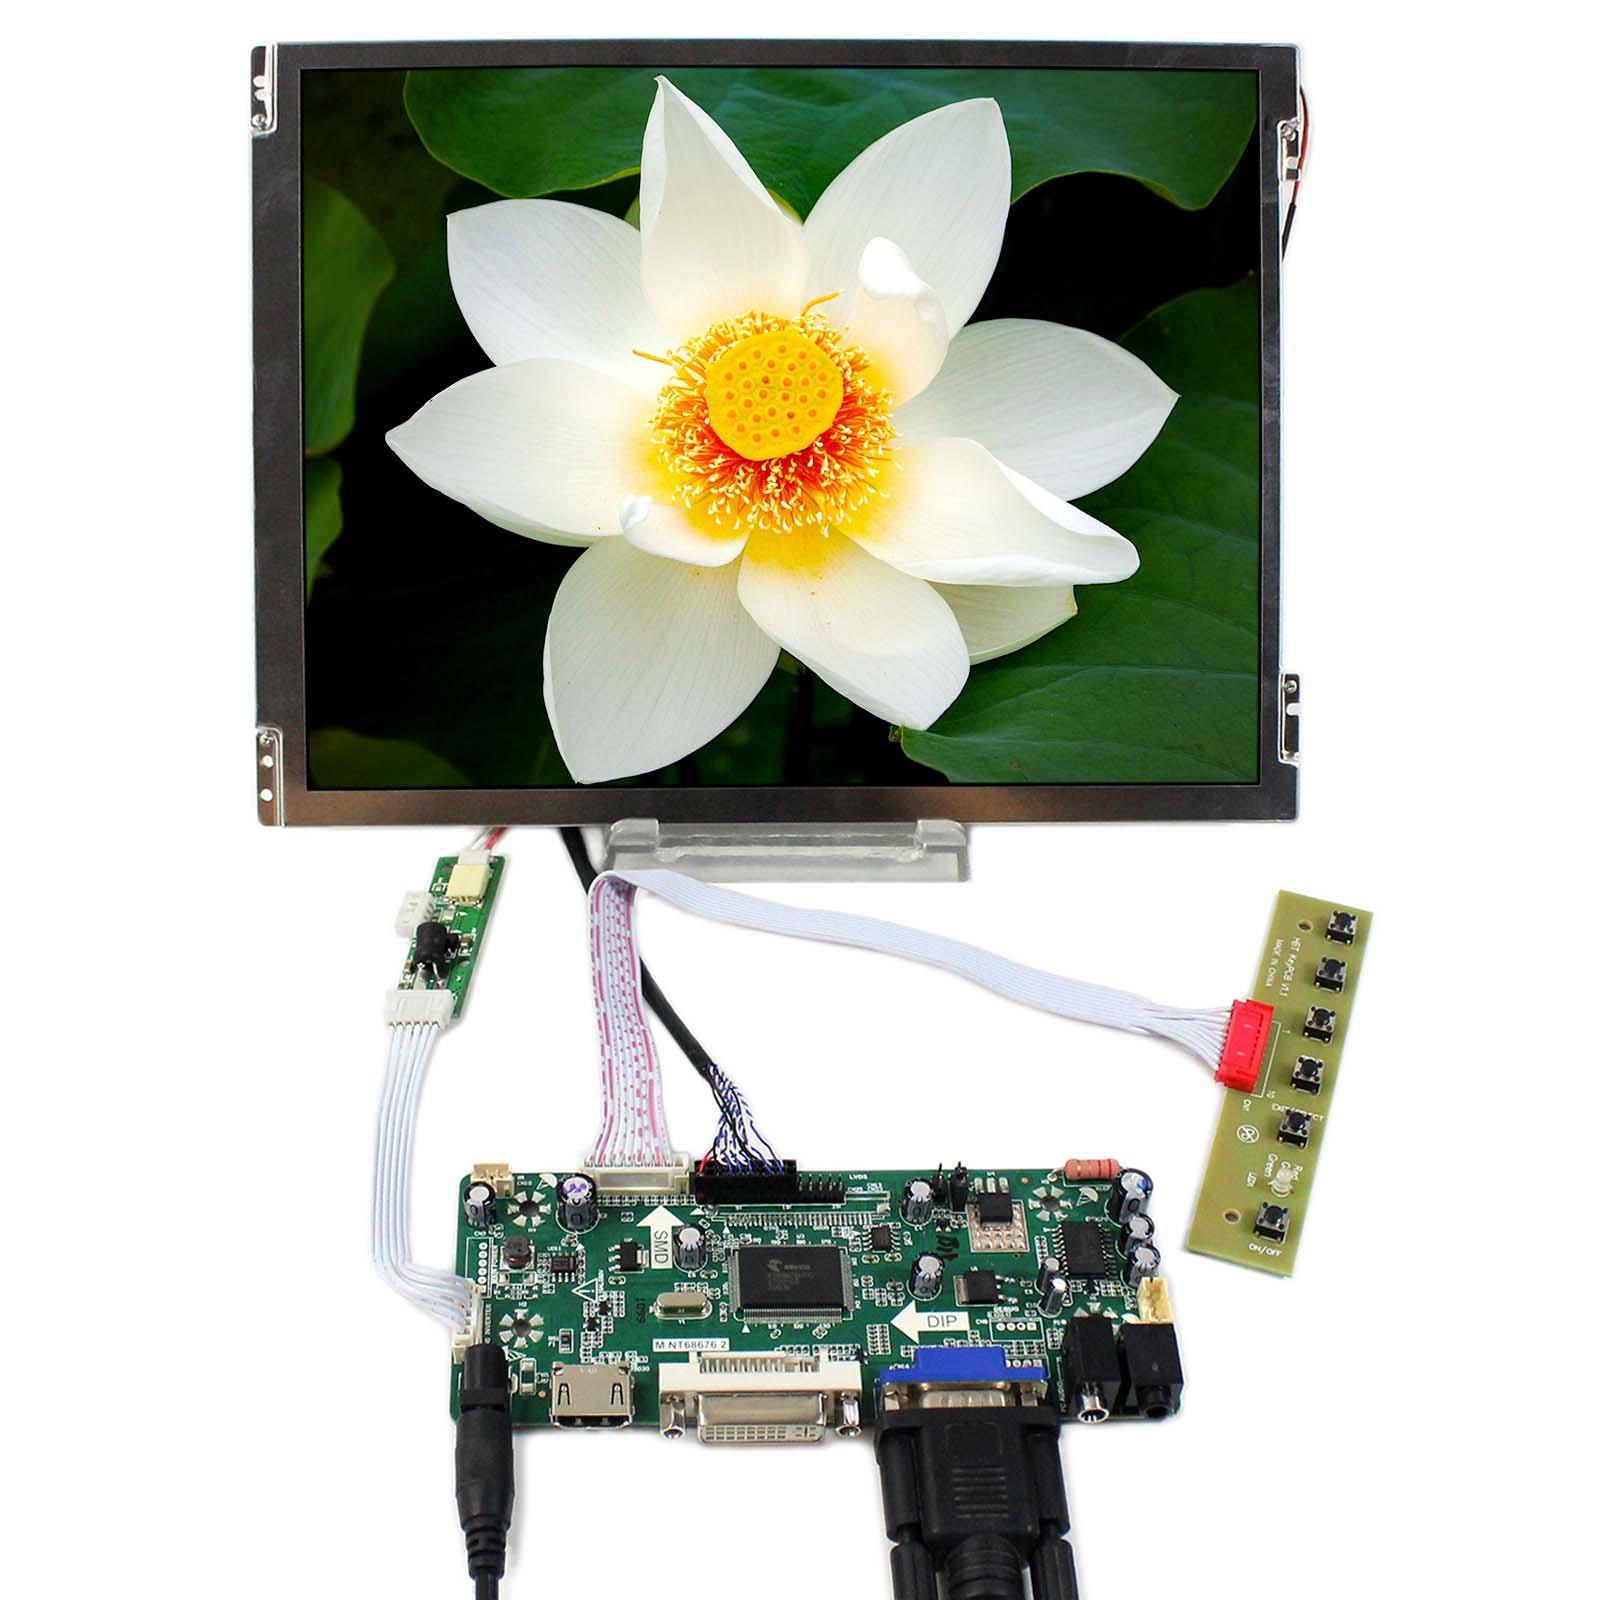 HDMI VGA DVI Audio LCD Controller Board With 10 4inch 800x600 TM104SDH01 LCD Screen